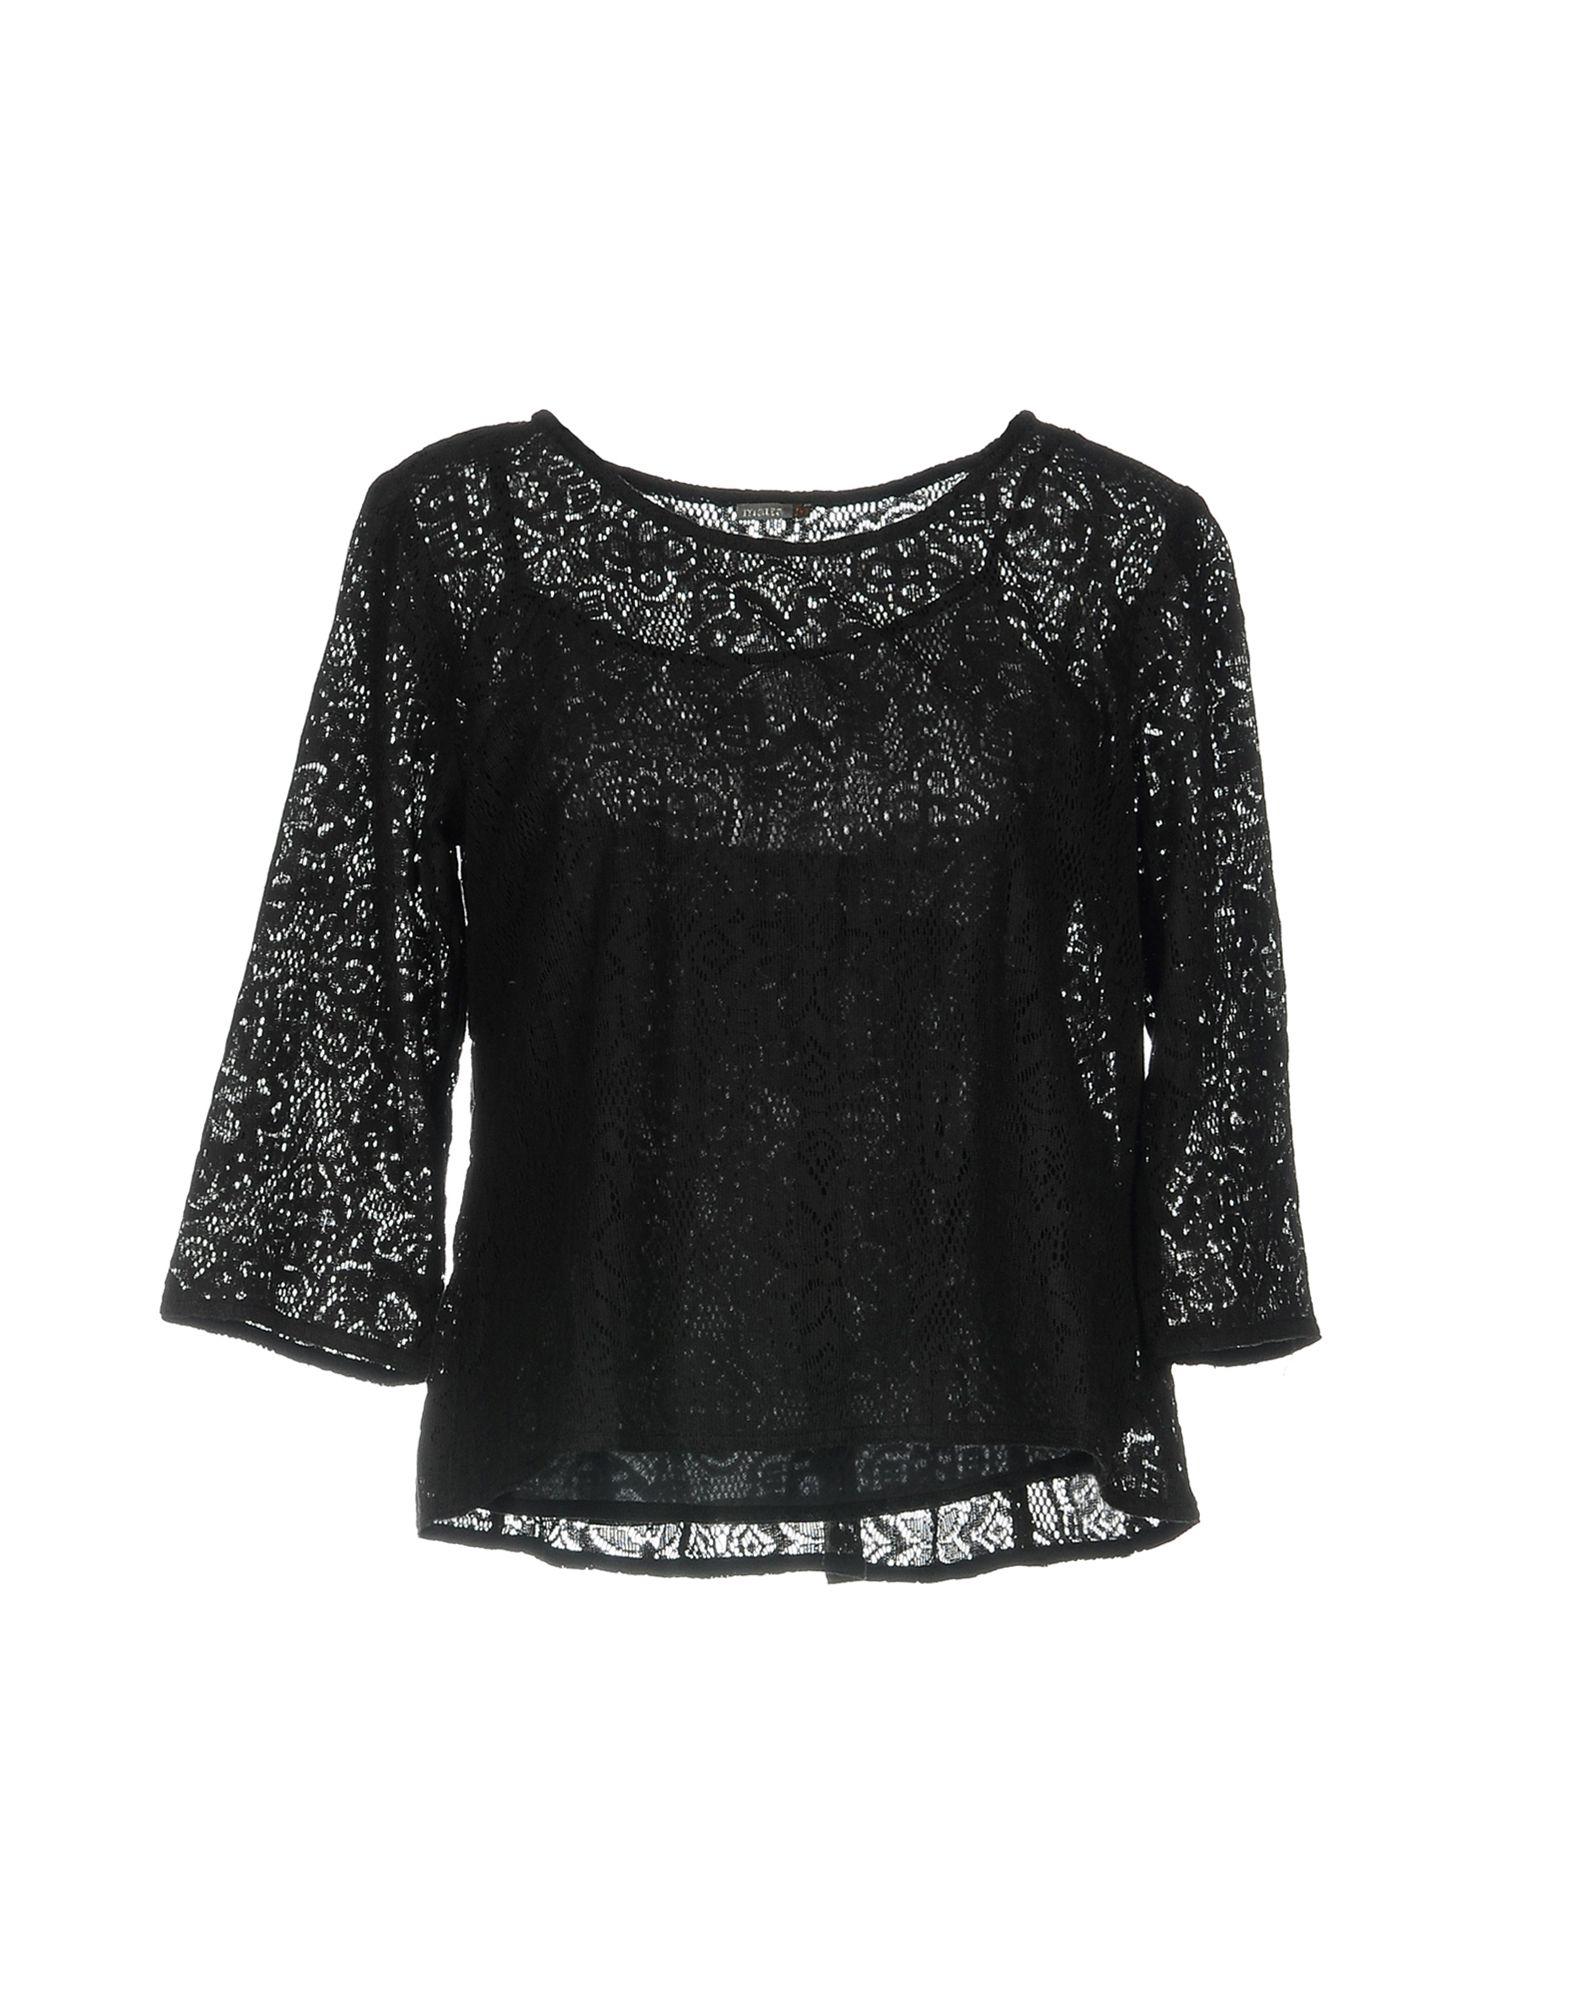 MATTA Blouse in Black